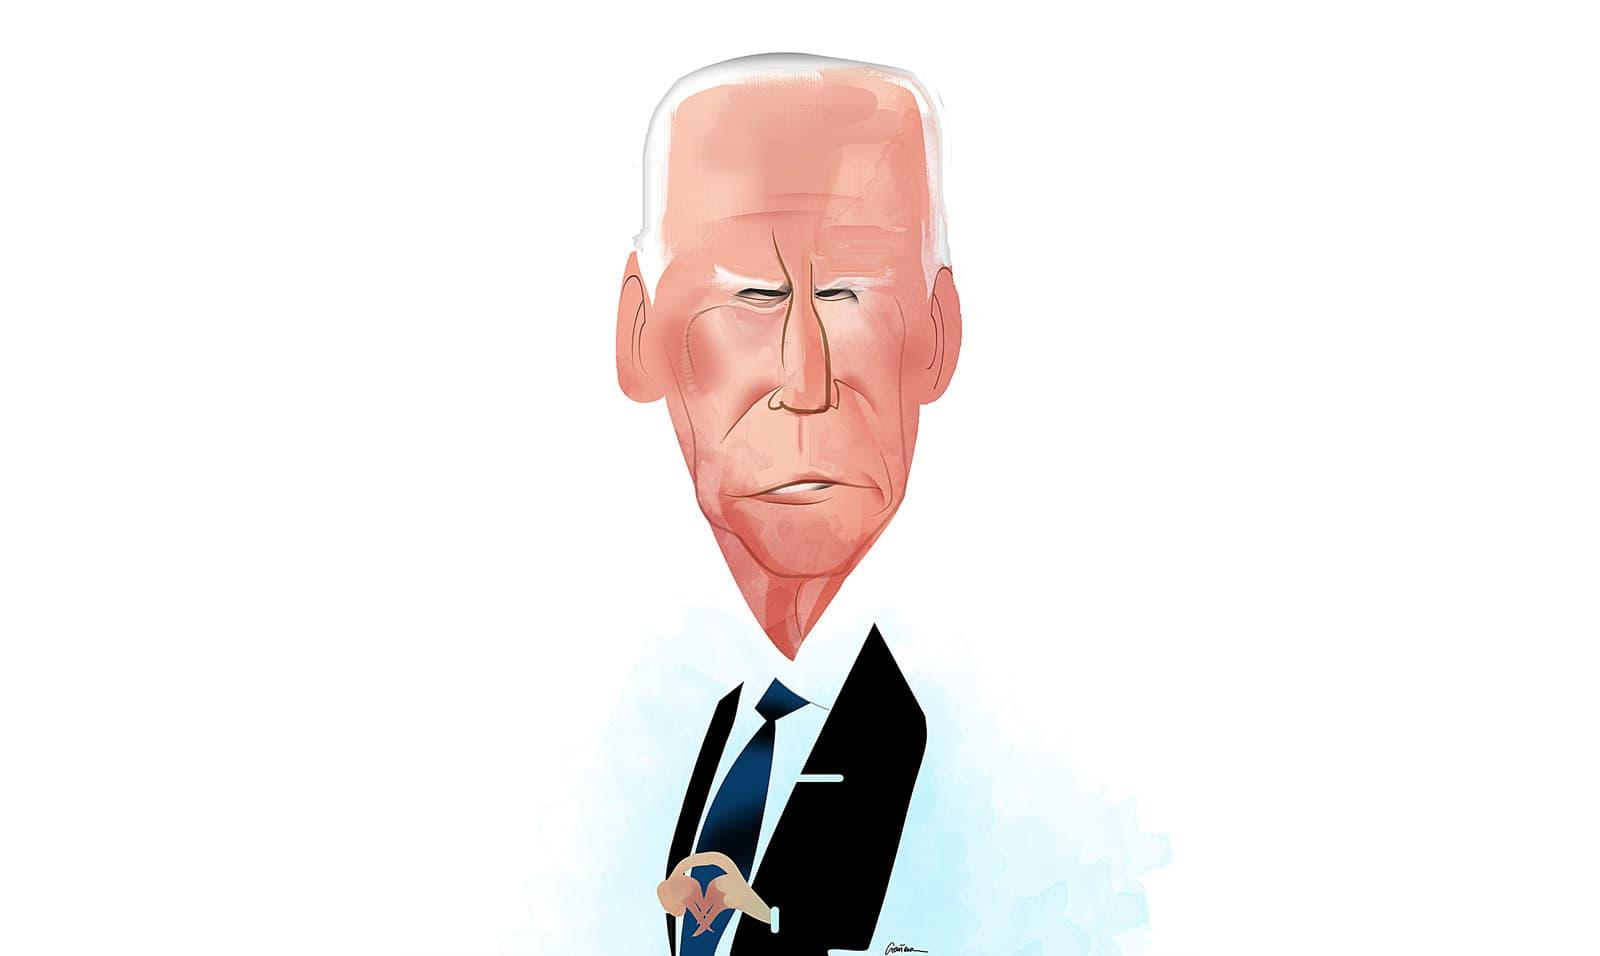 Caricatura de Joe Biden per Luís Grañena